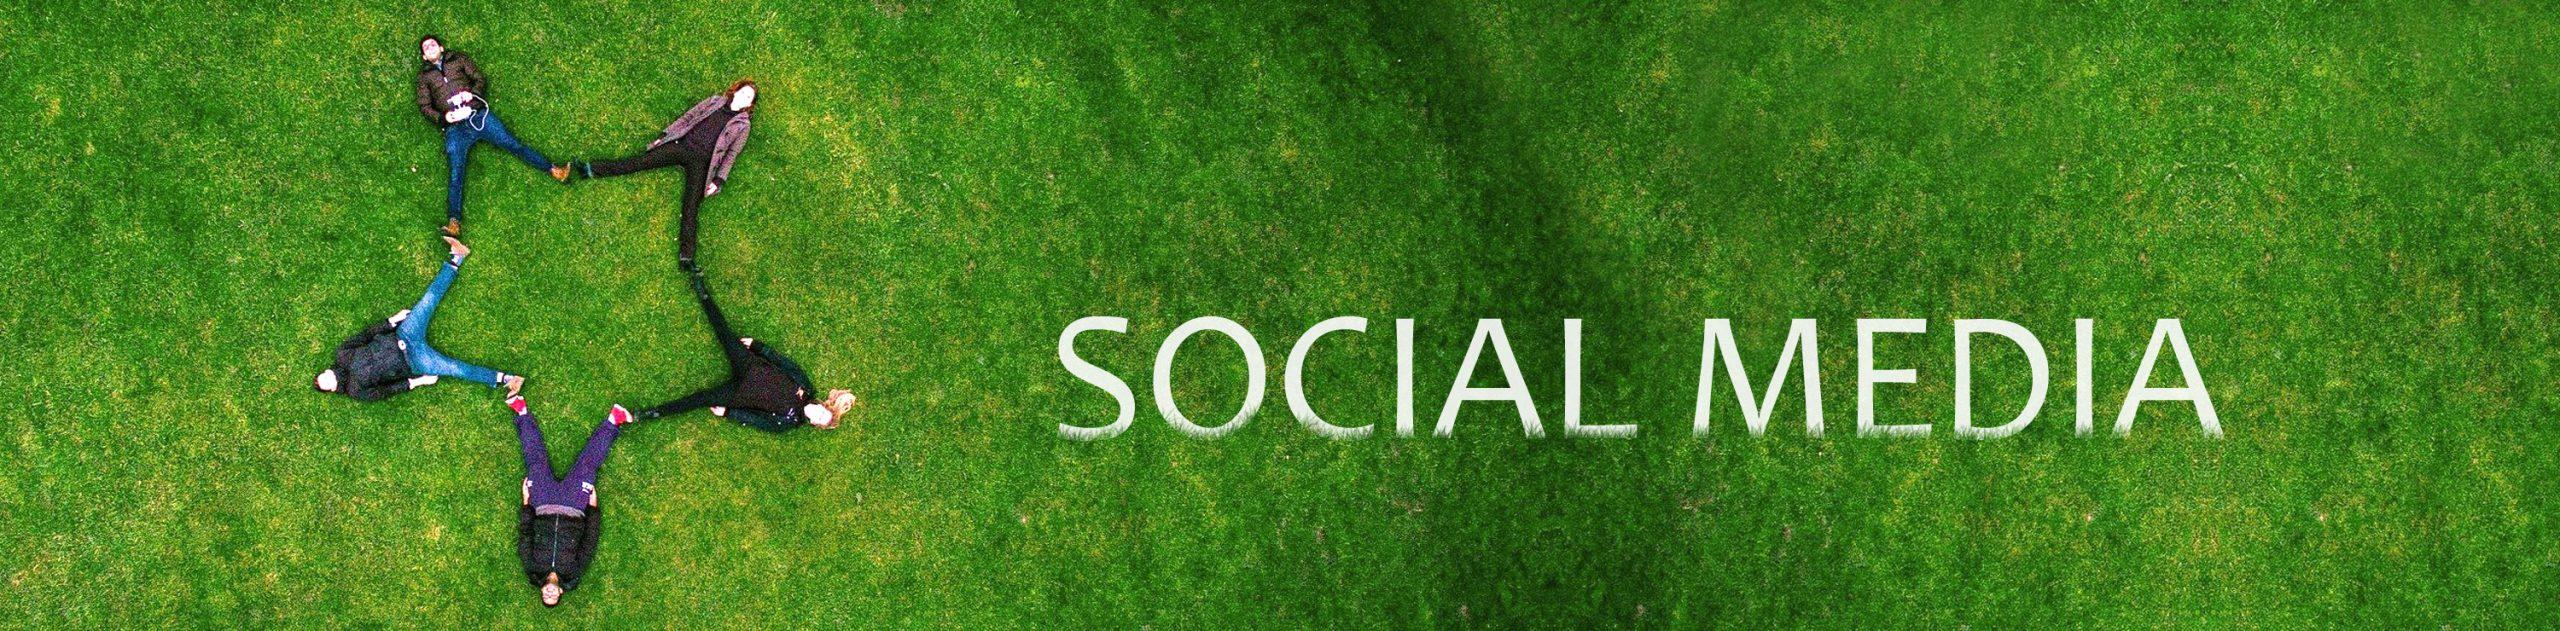 Social Media Betreuung in Sachsen & Brandenburg